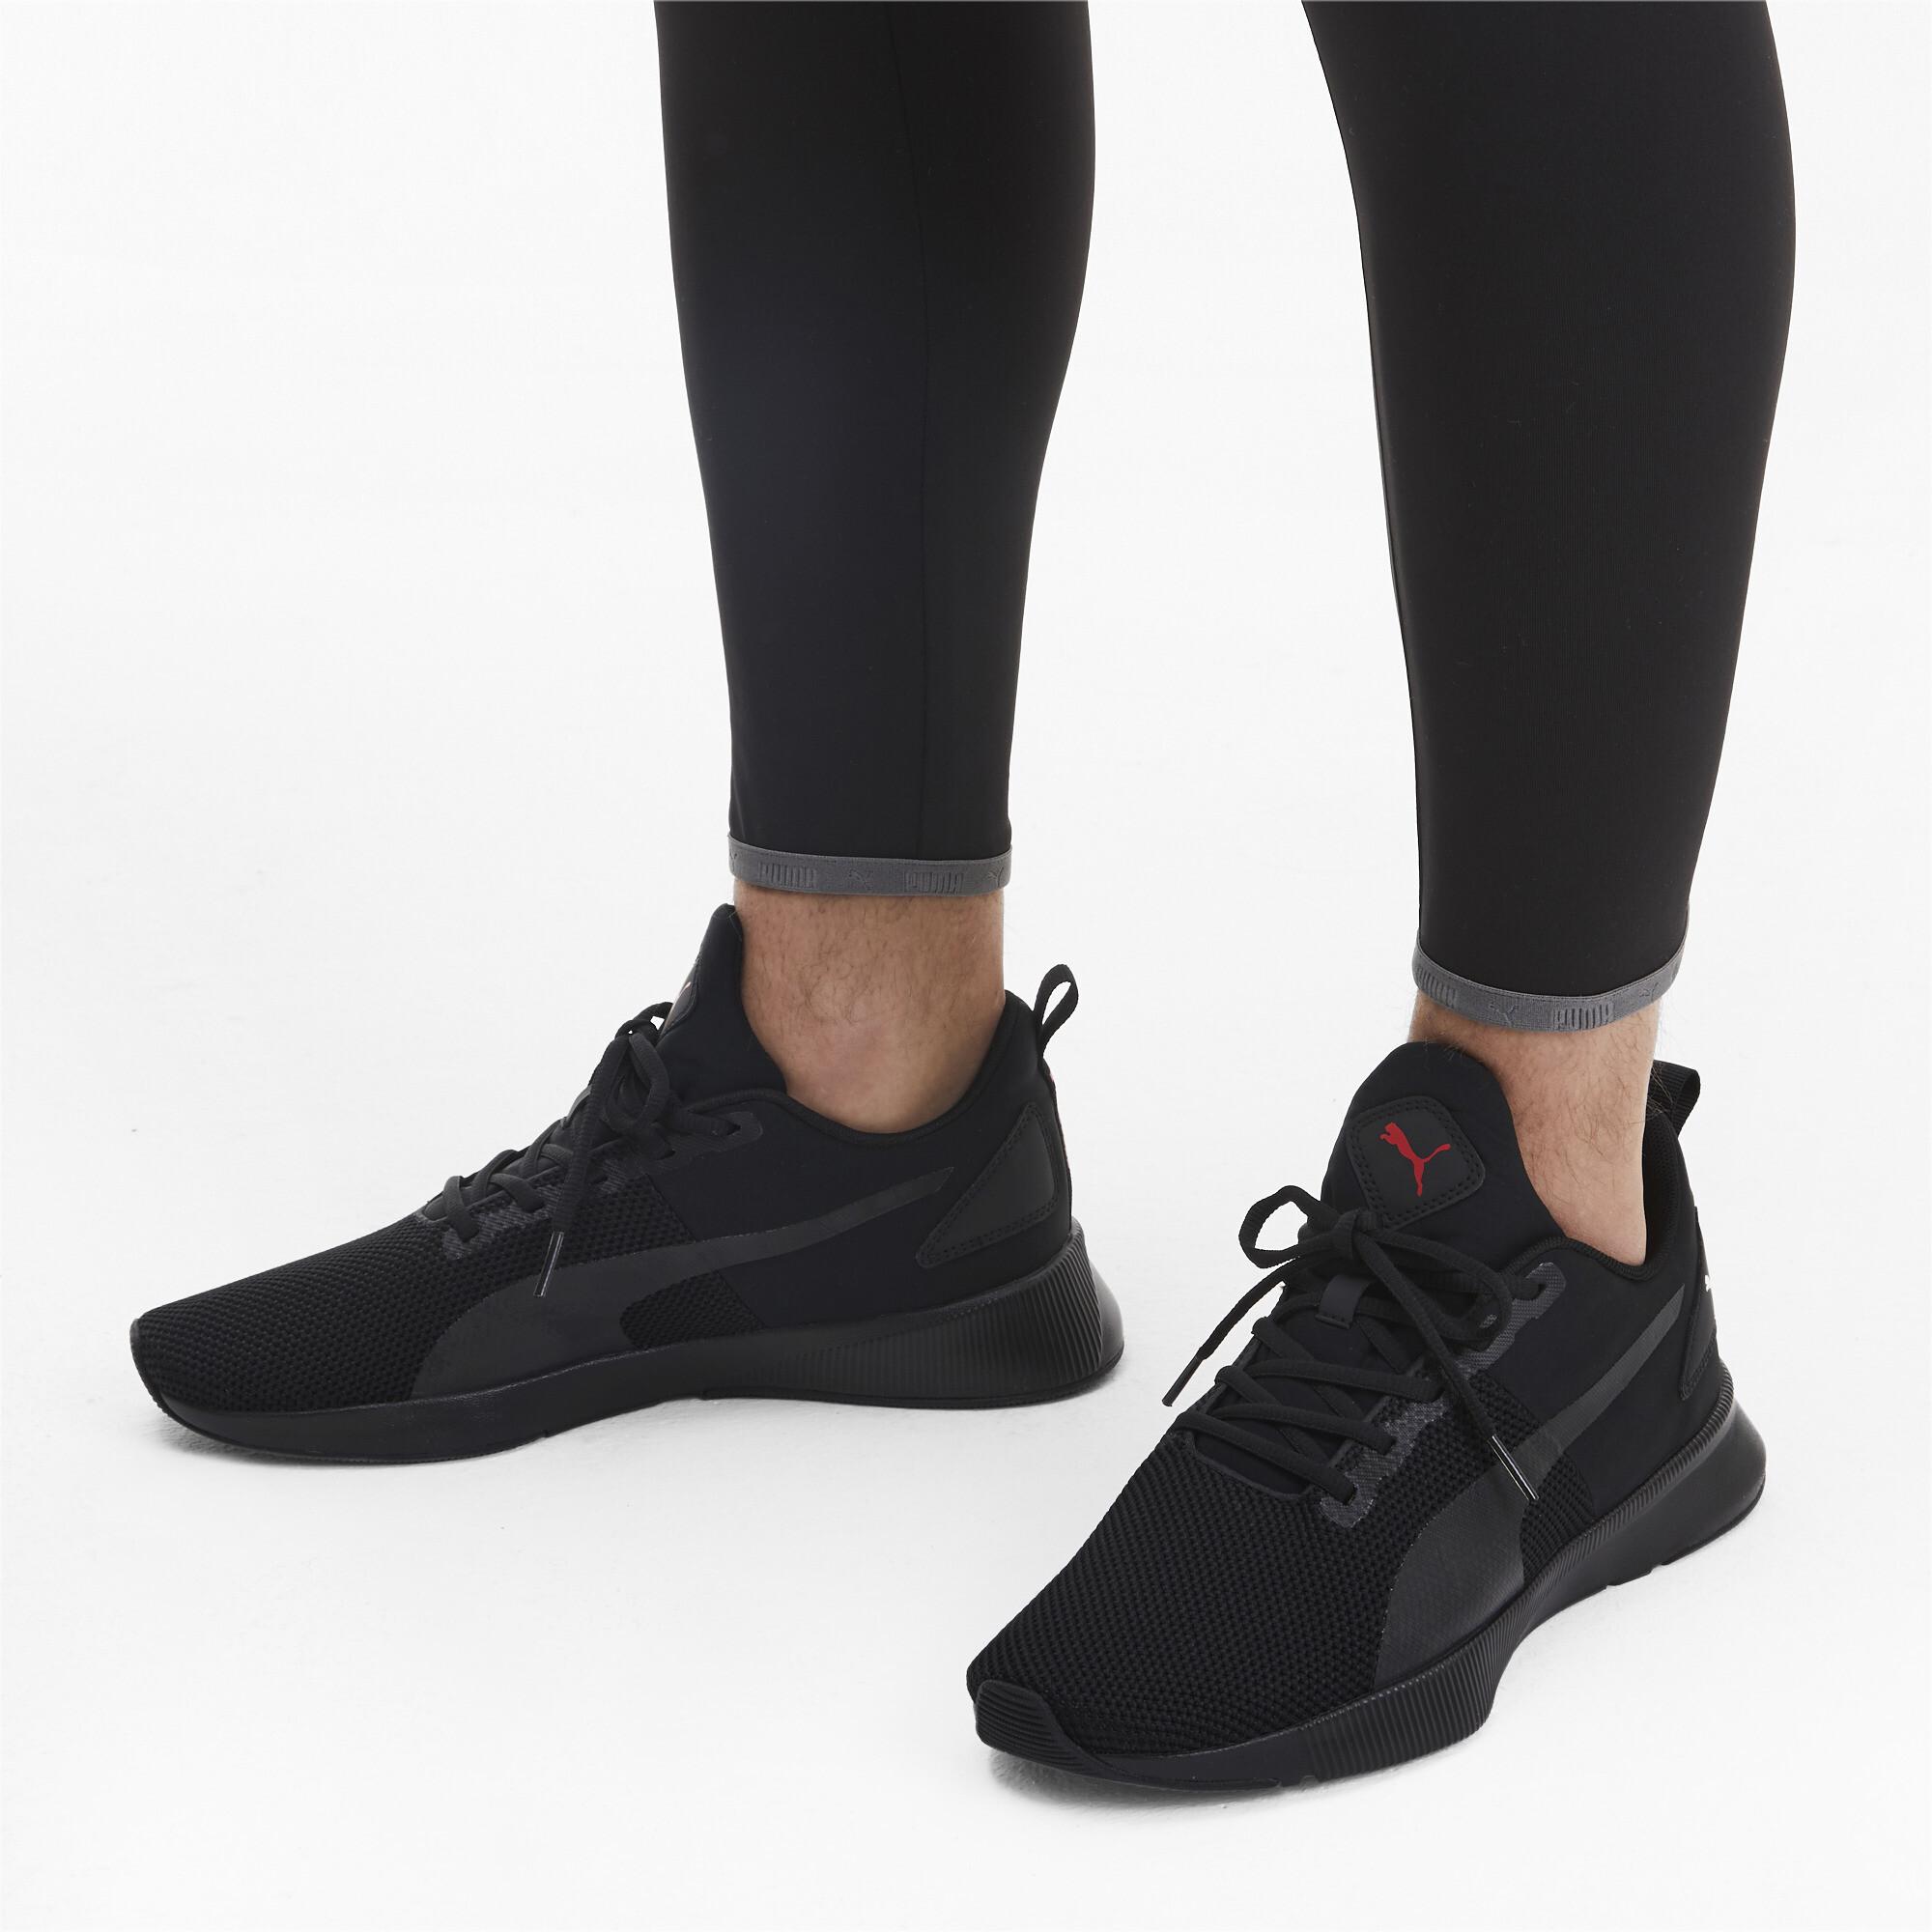 thumbnail 9 - PUMA Men's Flyer Runner Running Shoes